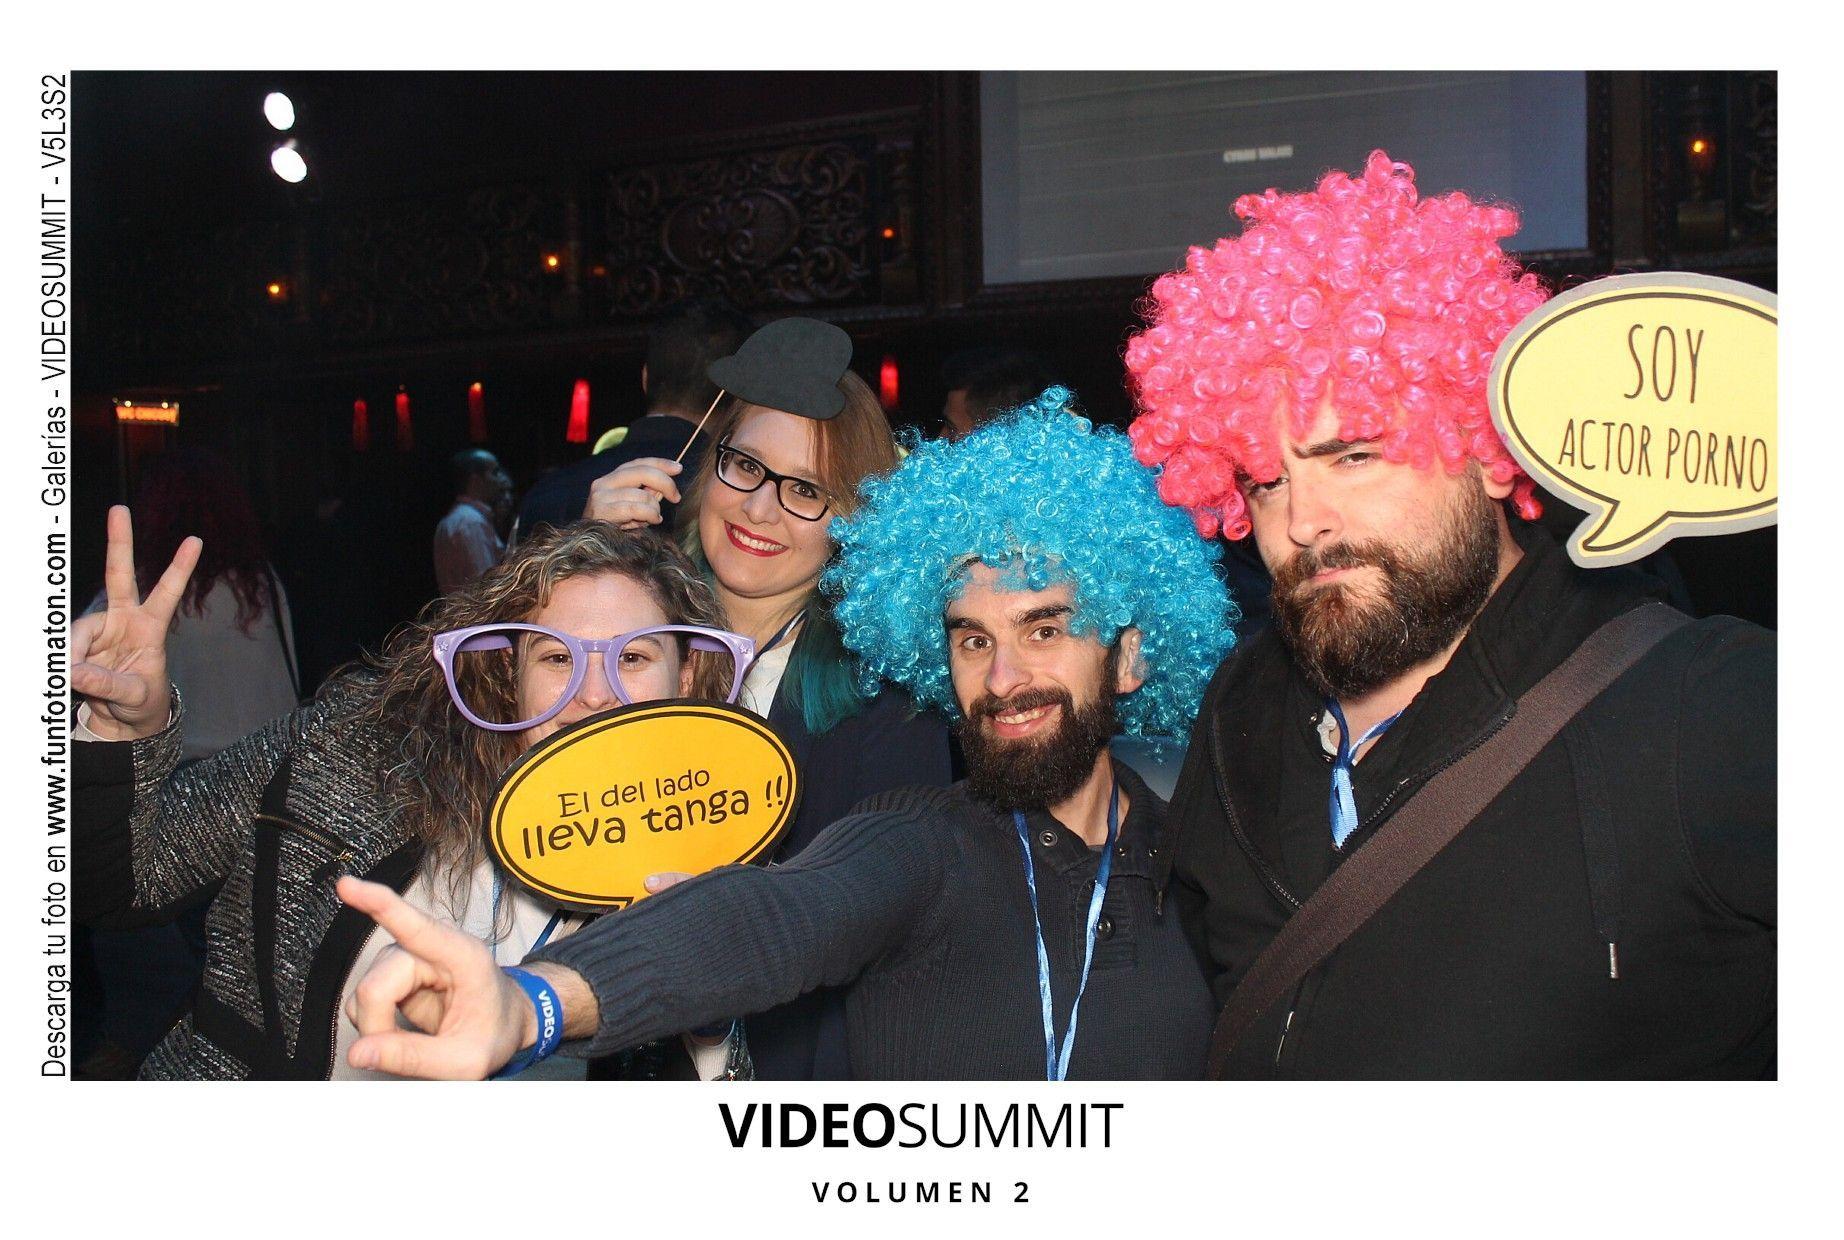 videosummit-vol2-club-party-050